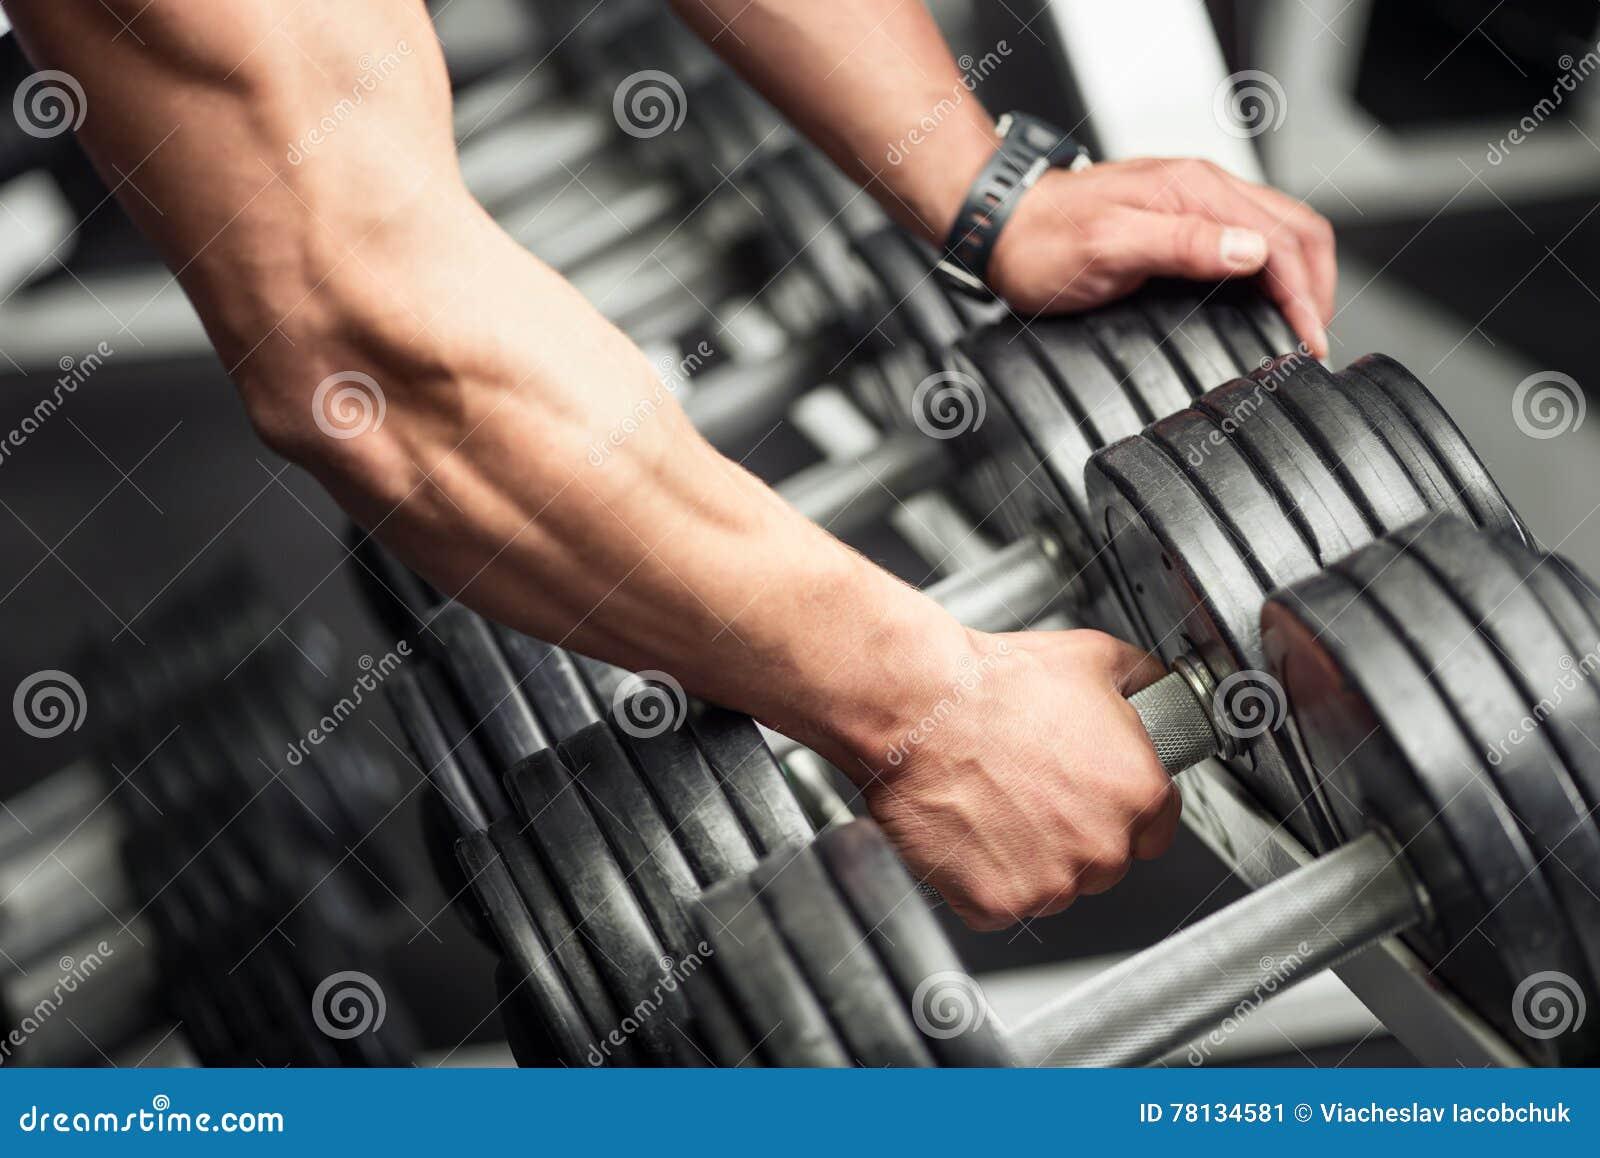 Strong well built bodybuilder lifting a dumbbell